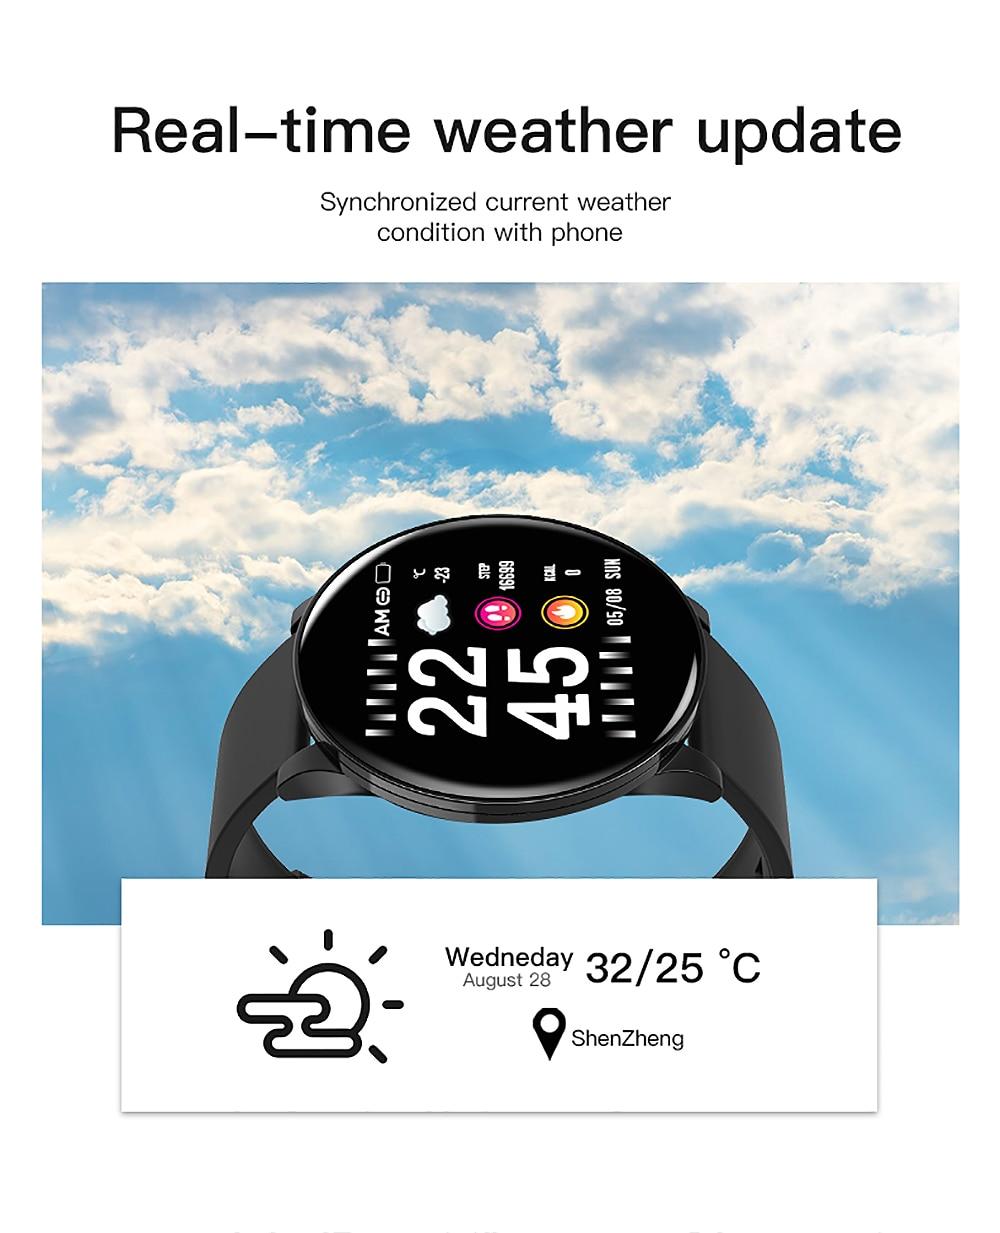 HTB1vP3qdB1D3KVjSZFyq6zuFpXaF Cobrafly W8 Smart Band Steel Strip IP67 Waterproof Fitness Tracker Watch Men Women Smart Sports Clock Heart Rate Monitor Watches